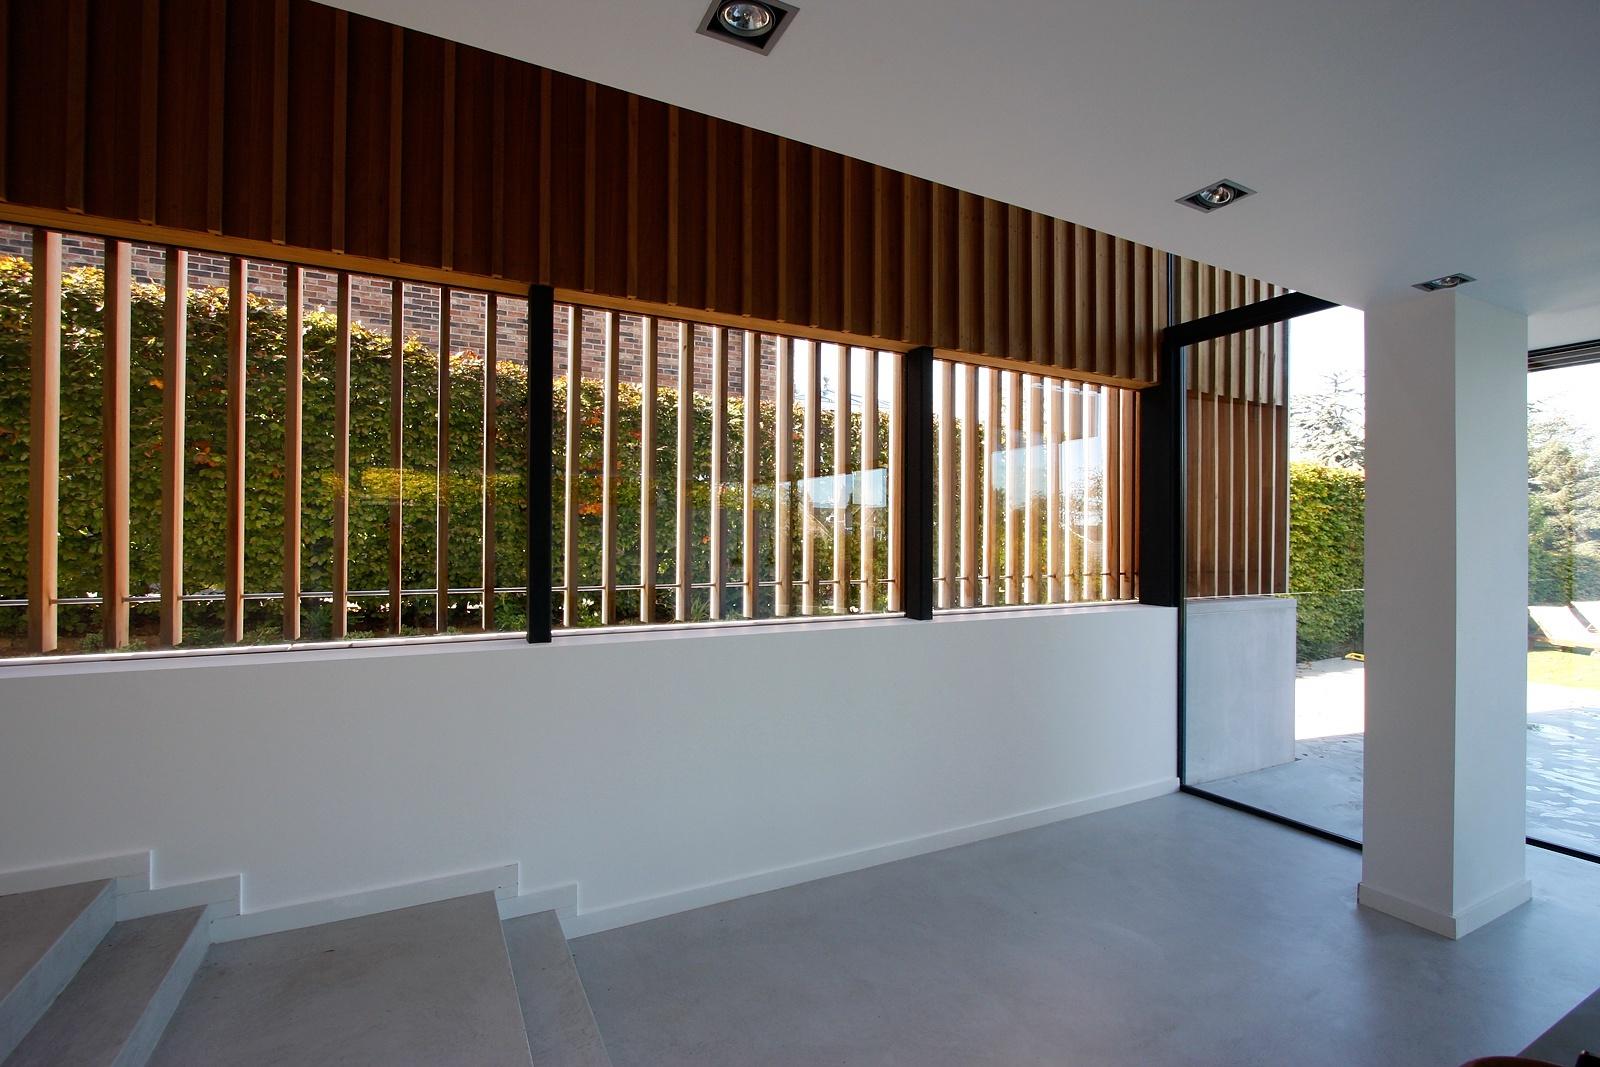 keller minimal pivoting window in new build house